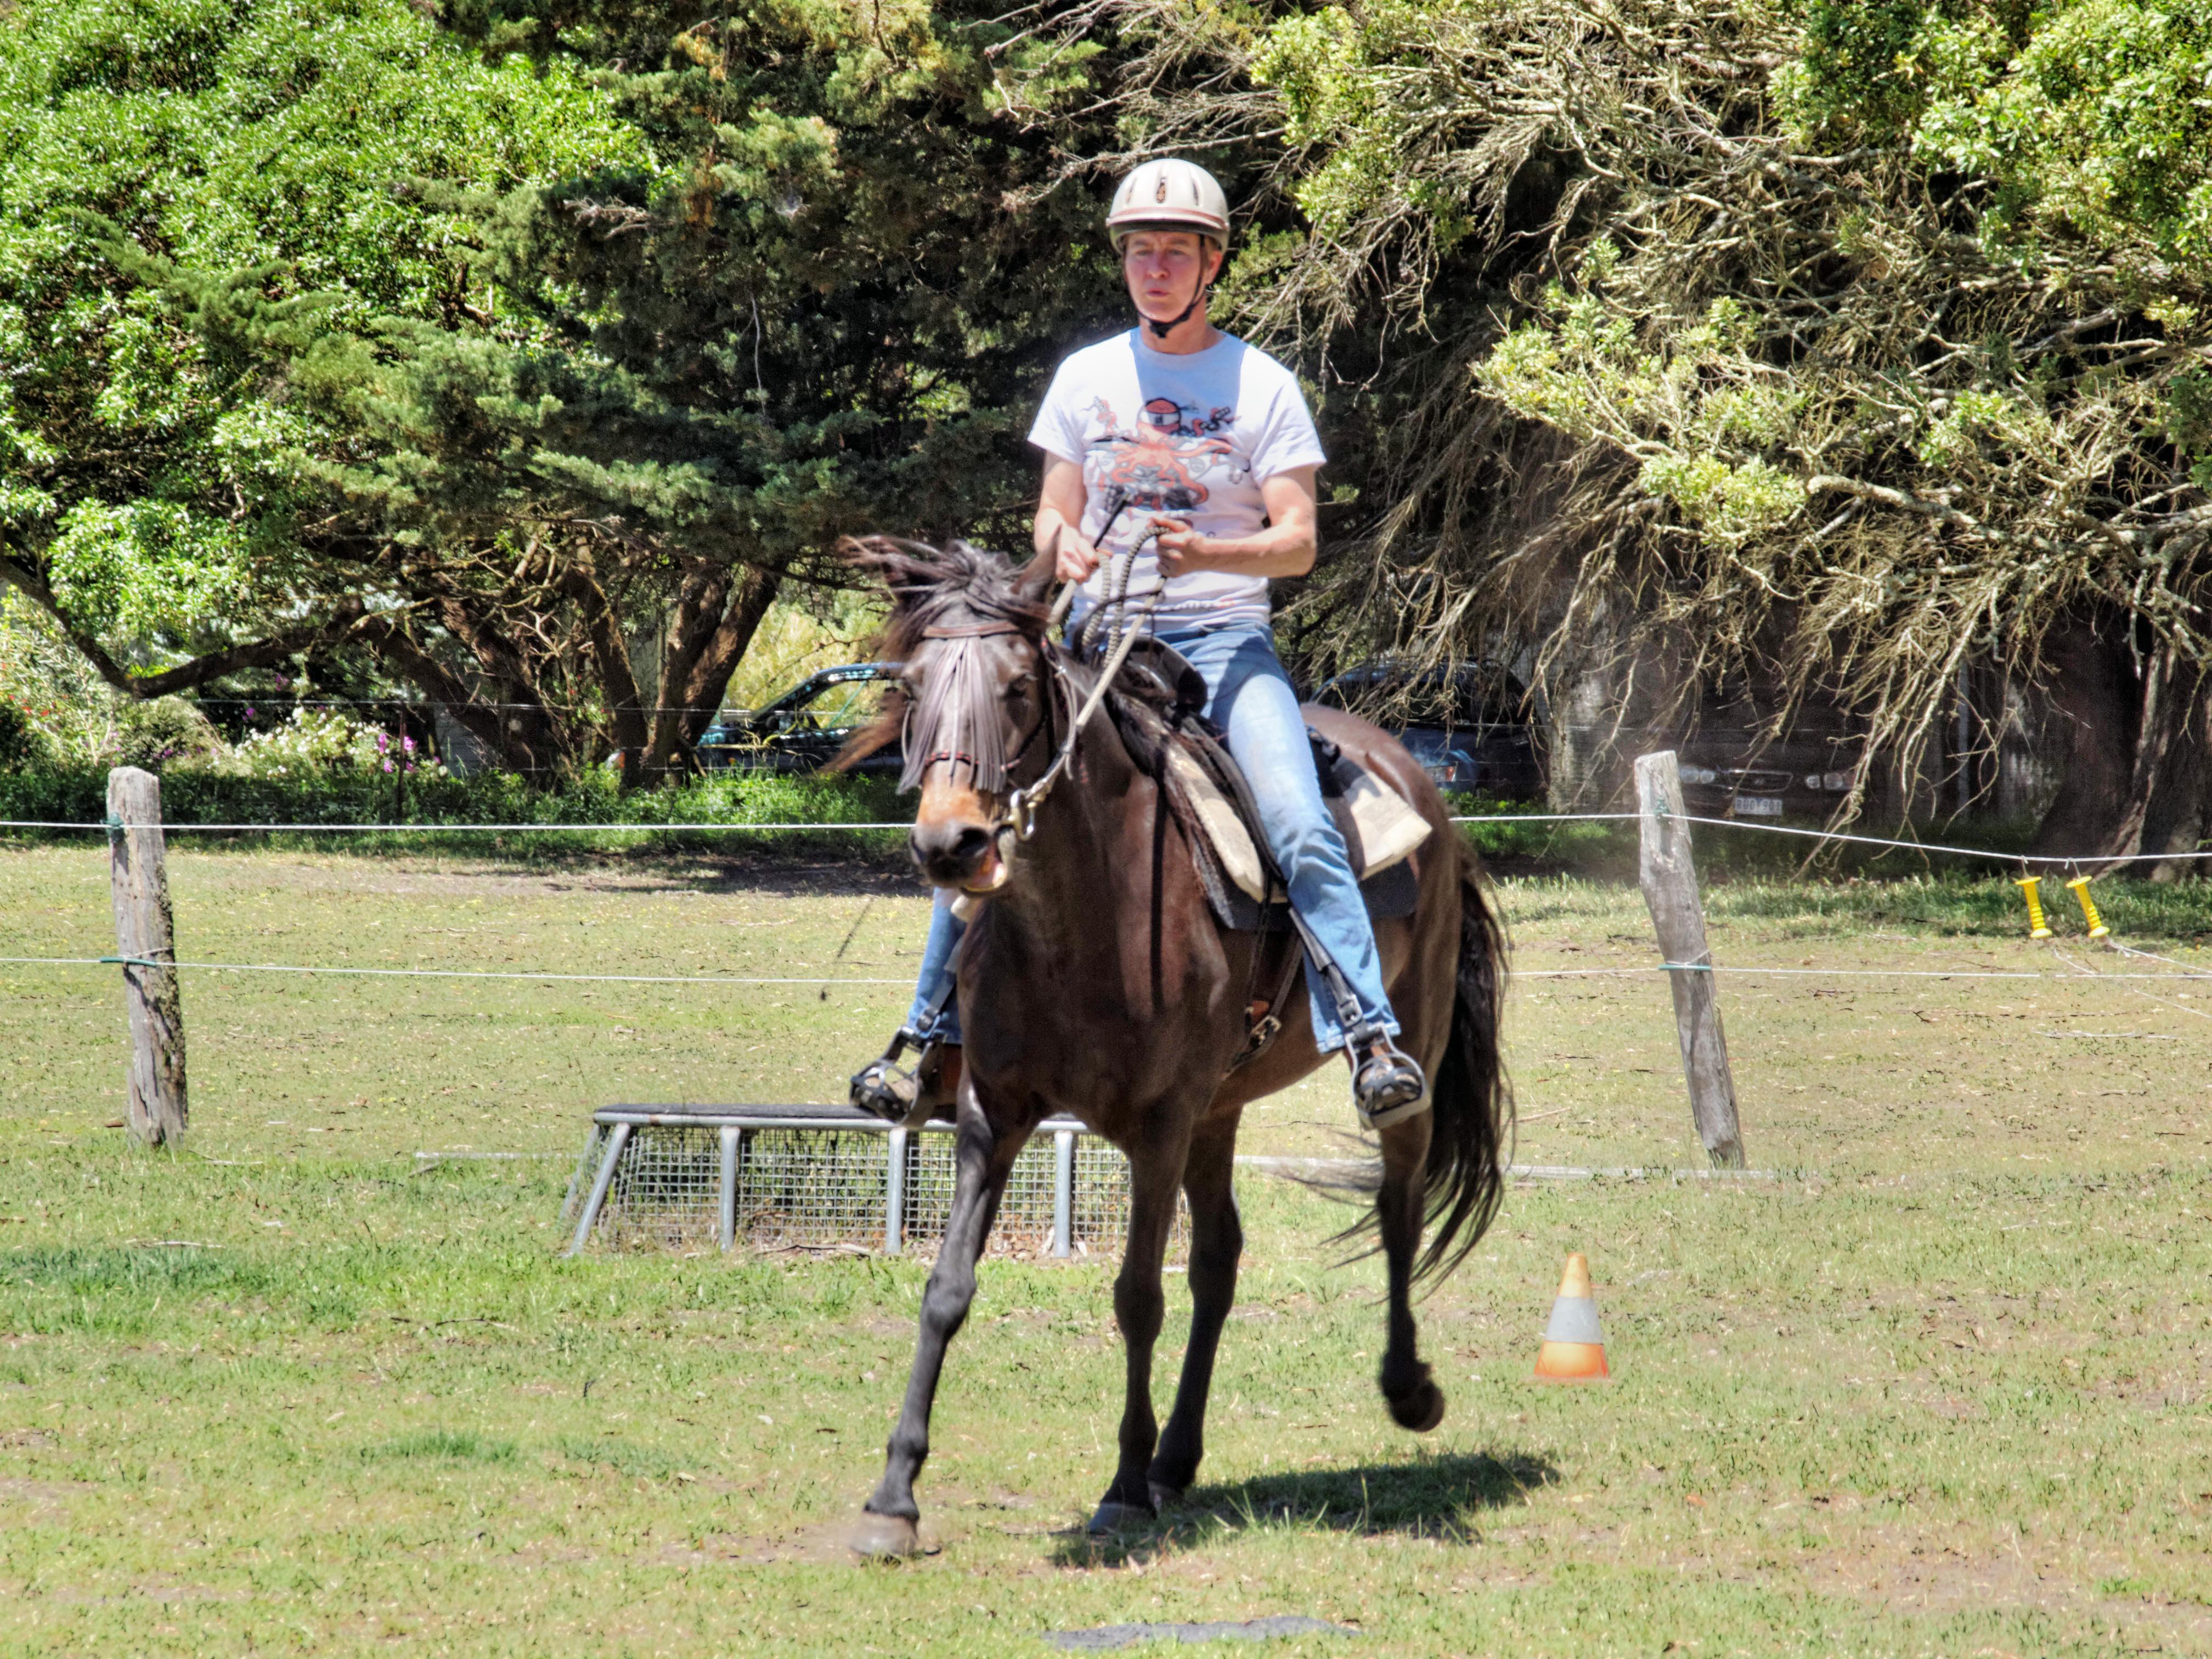 Riding-25.jpeg